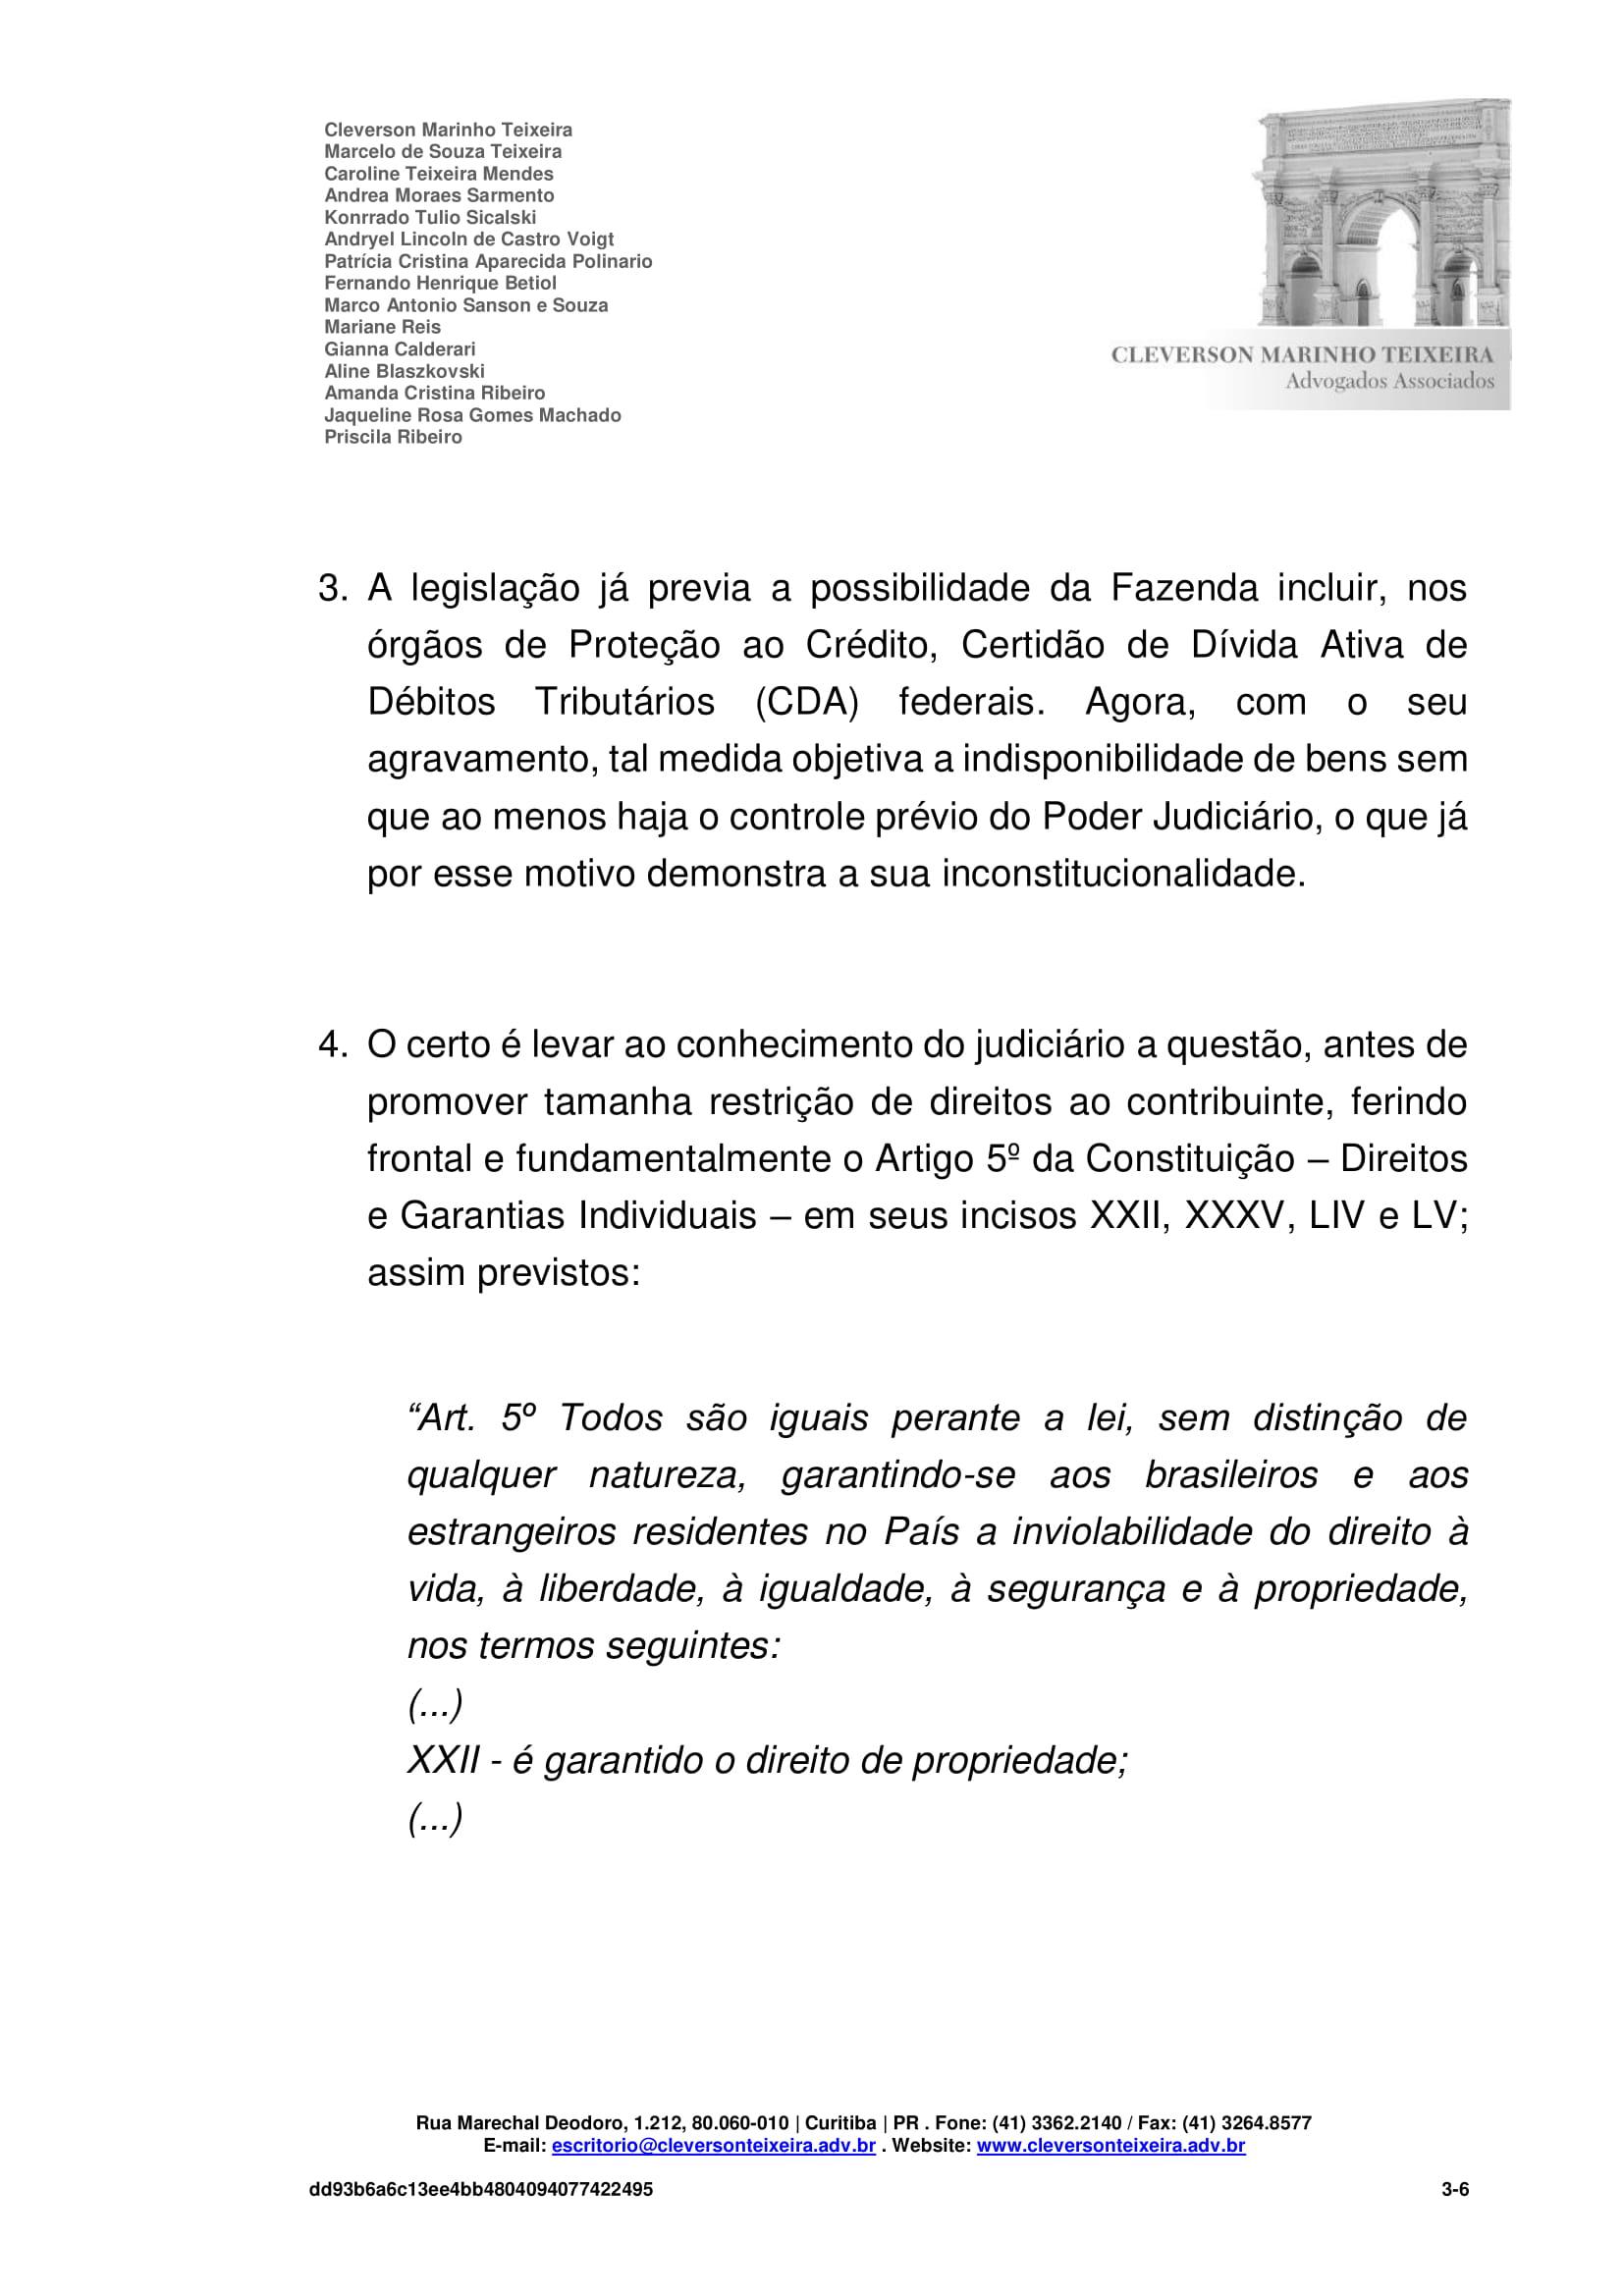 MANIFESTAÇÃO - IDL 2 (25 01 2016) (1)-3